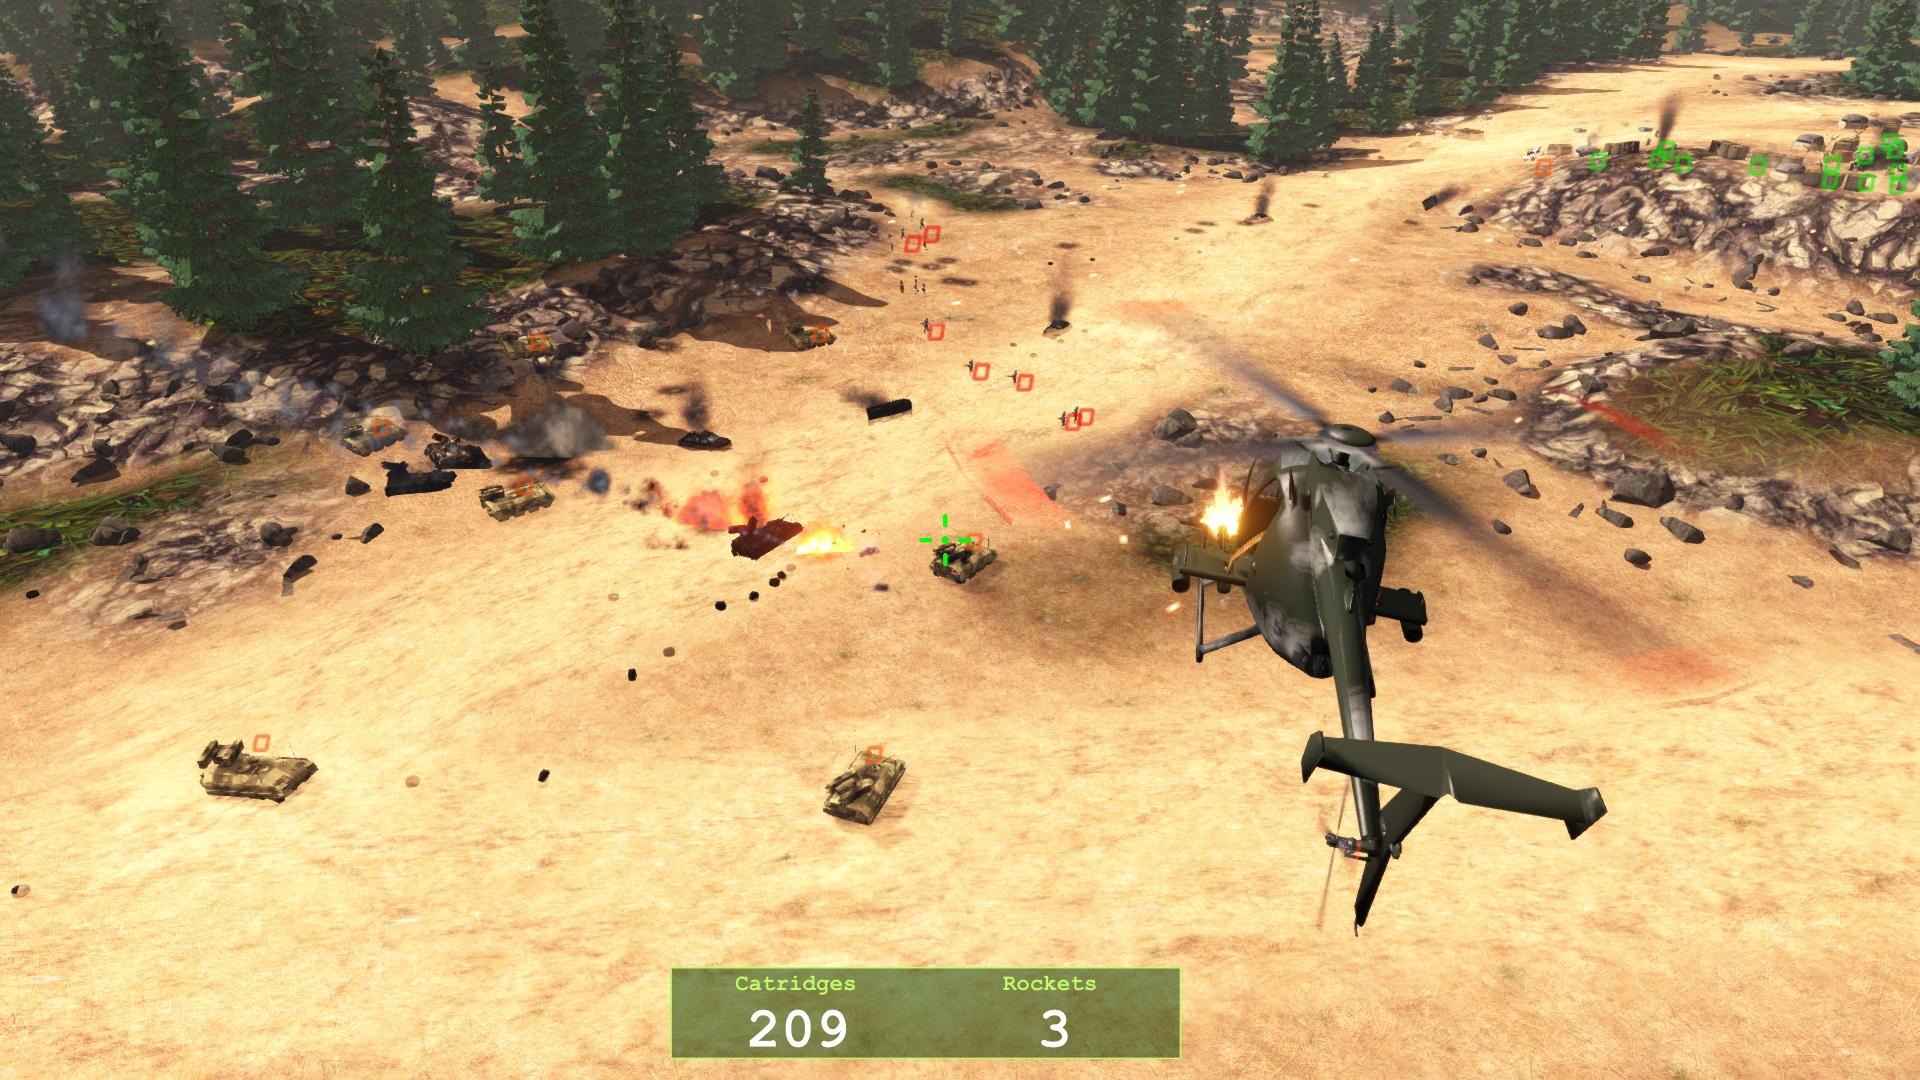 download aerial destruction frontline assault inc. all dlcs and updates repack by corepack fitgirl singlelink iso rar part kumpulbagi diskokosmiko